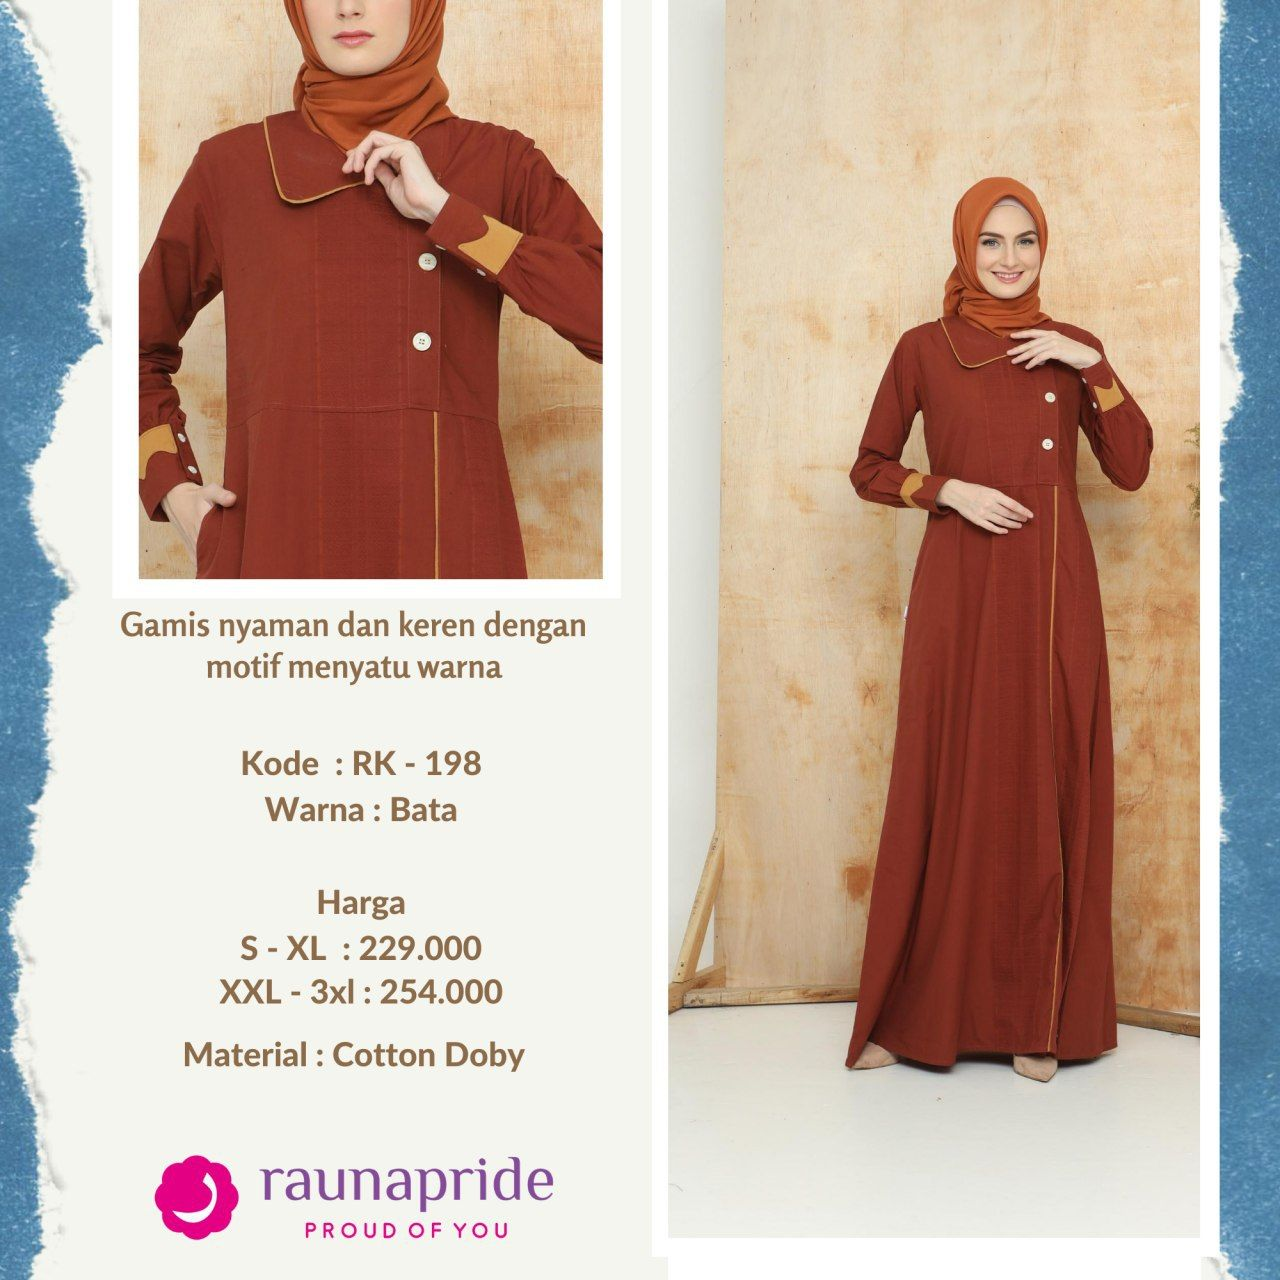 Termurah Wa 62896 1230 8363 Baju Gamis Rauna Pati Baju Rauna Terbaru Pati Baju Anak Rauna Baju Muslim Baju Anak